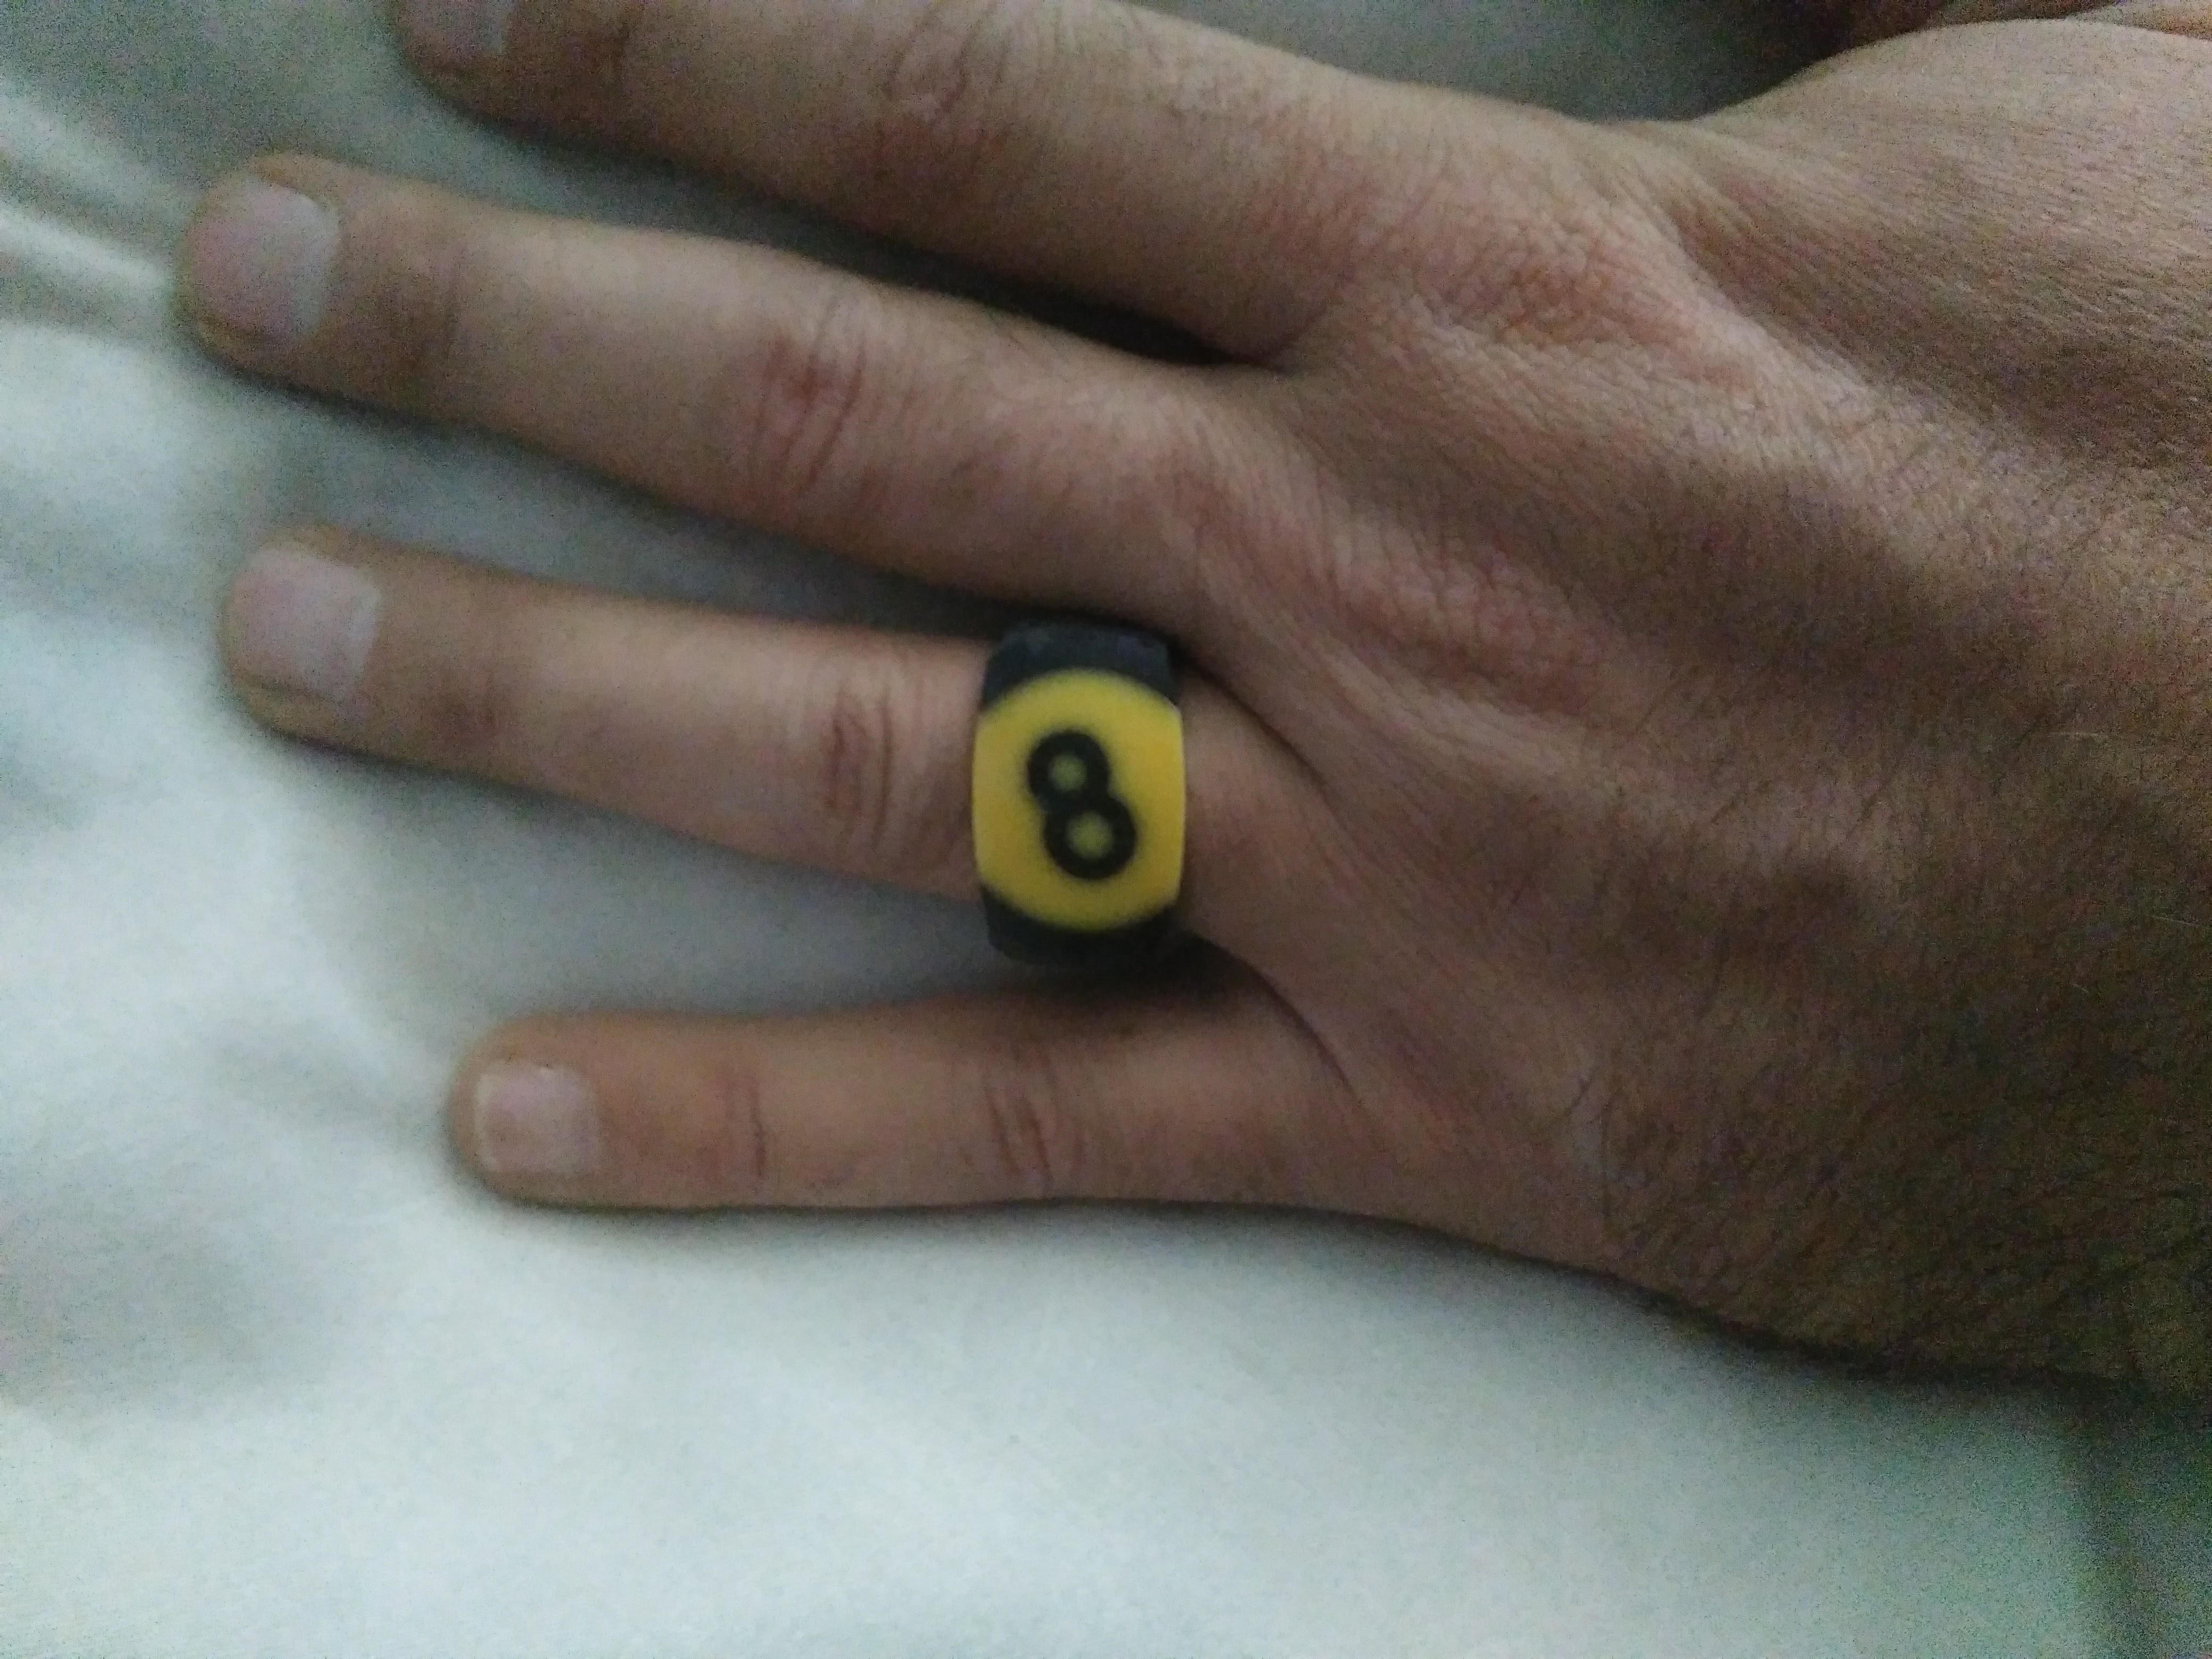 Picture of Repurposed Billiard Balls to Make Pool Ball Rings